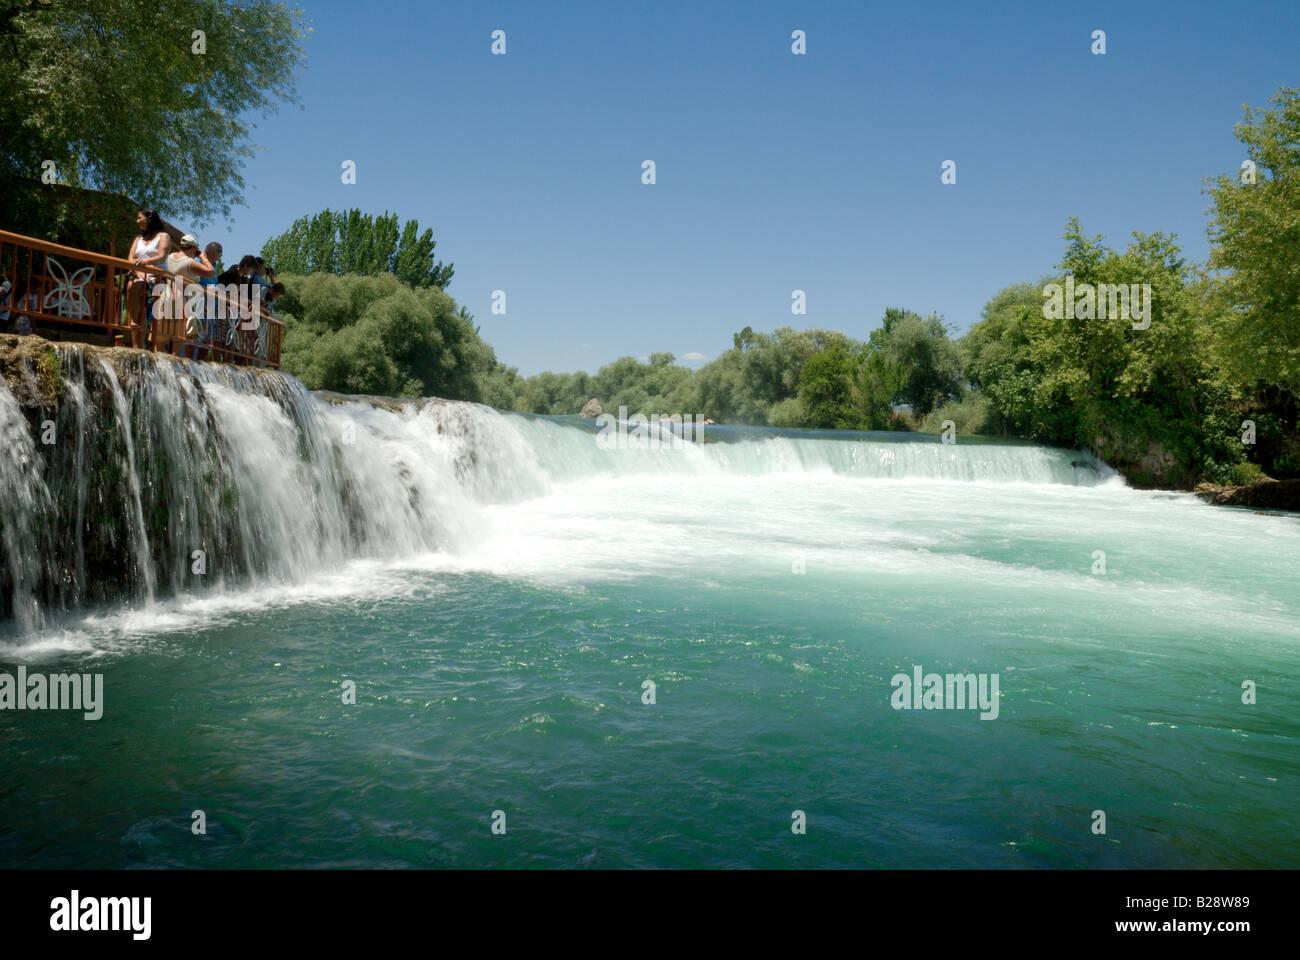 Manavgat Falls, Antalya, Turkey - Stock Image